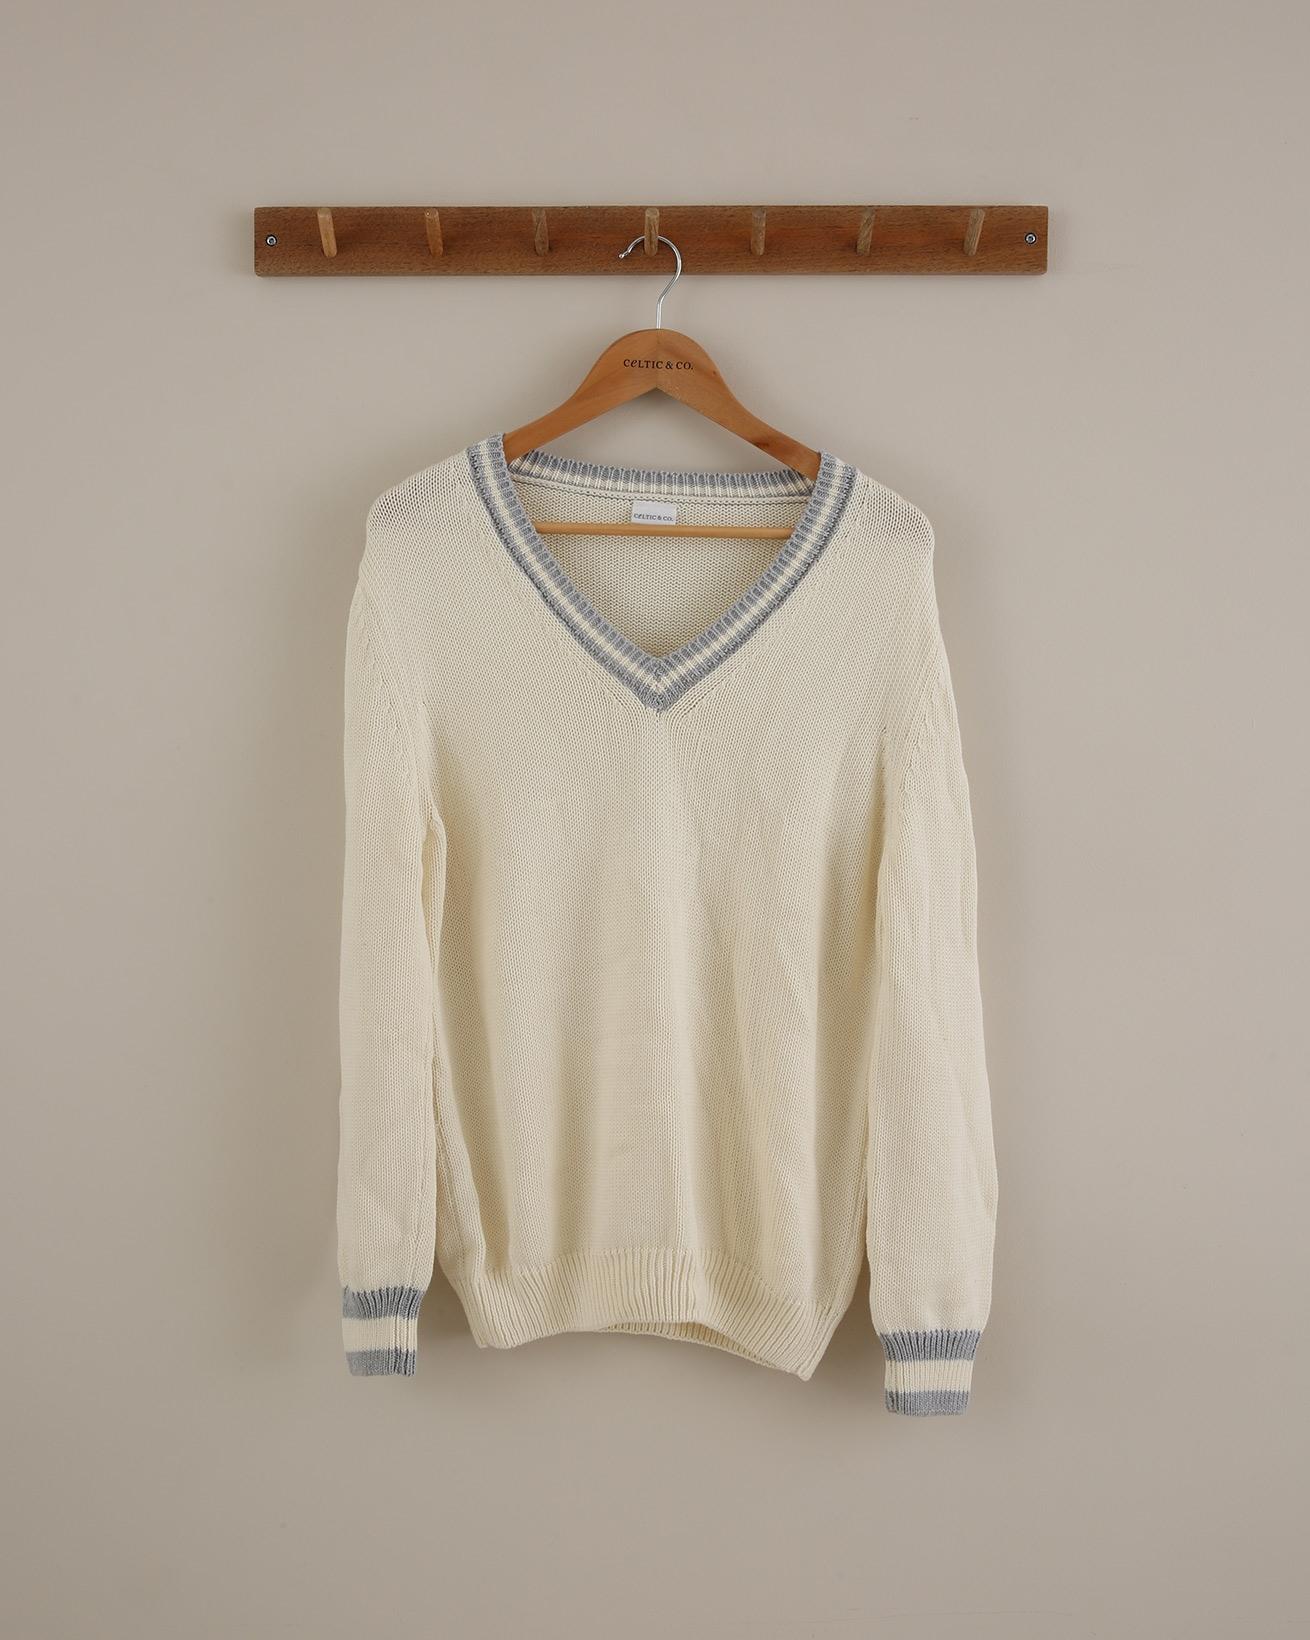 Tipped Cotton V Neck Jumper - Size Small - Ecru - 1652